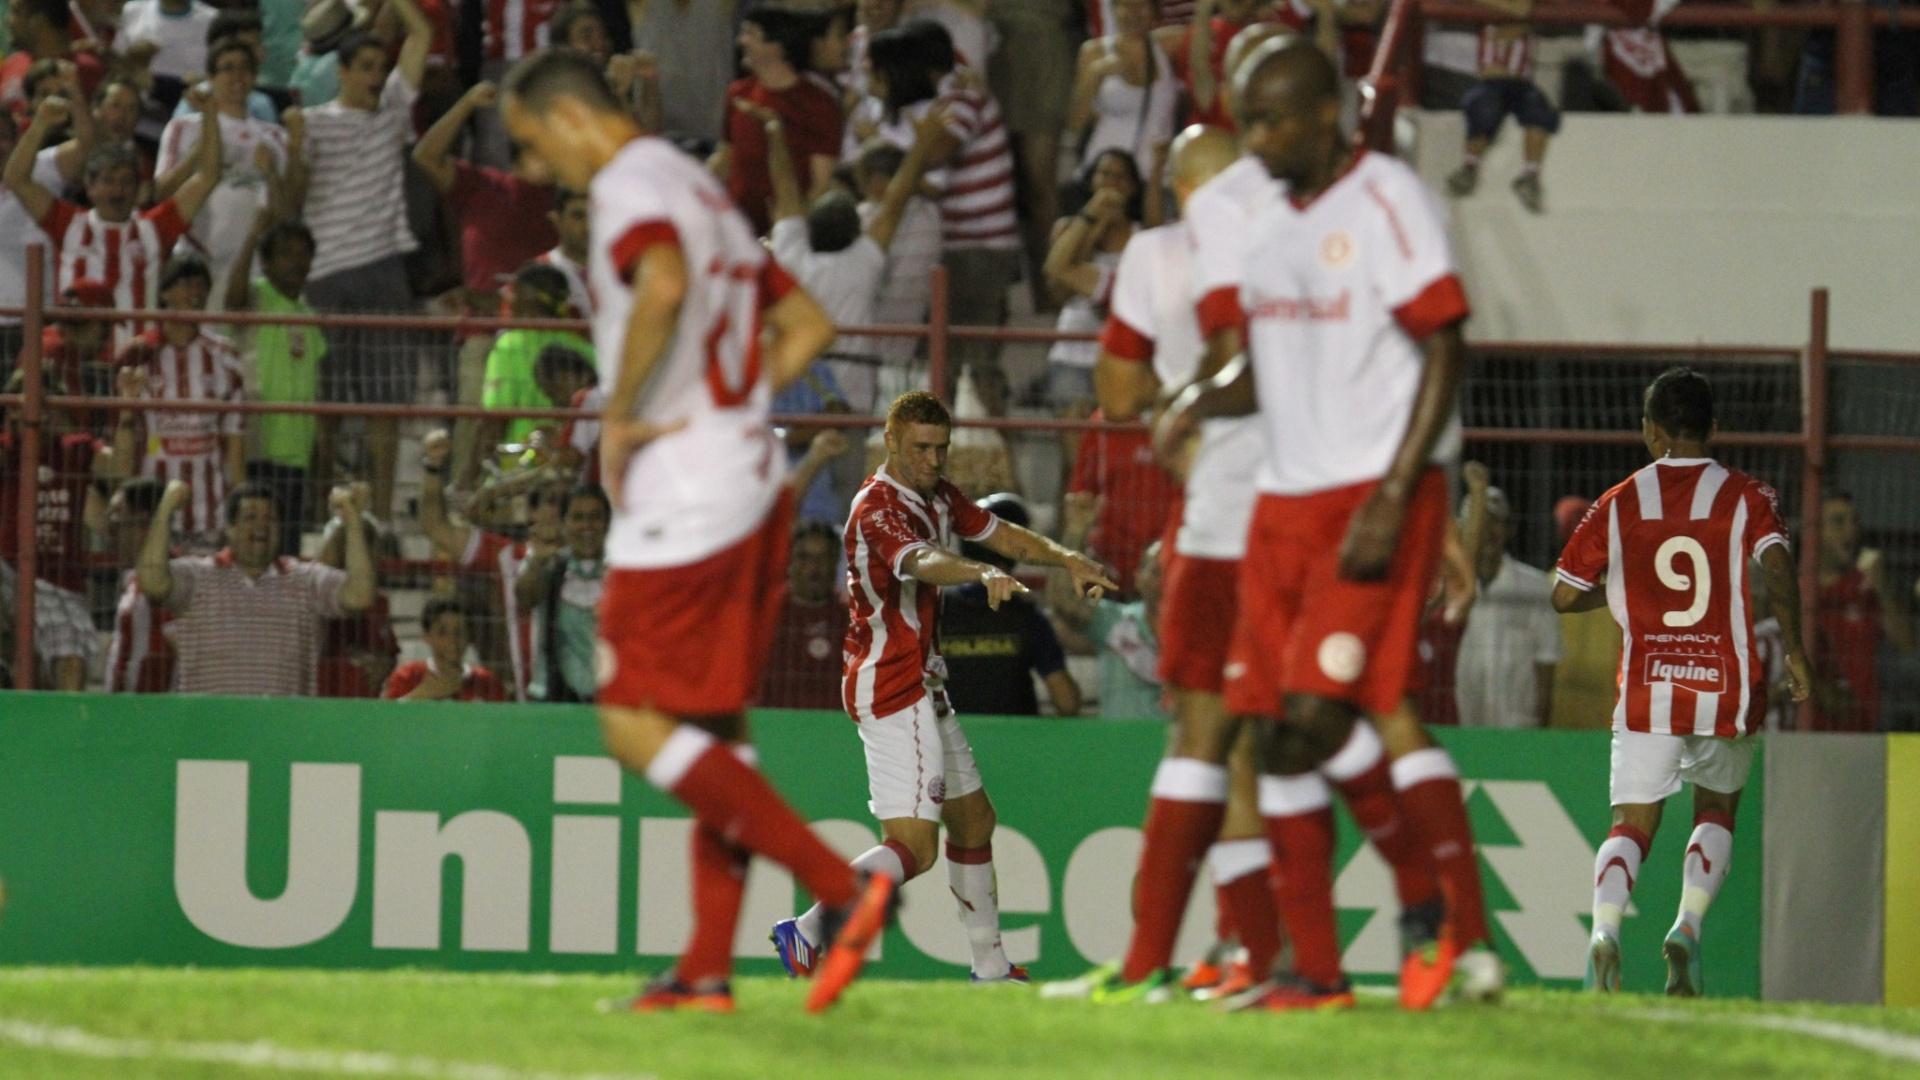 Souza (fundo), do Náutico, comemora gol marcado contra o Internacional; jogadores do Inter lamentam